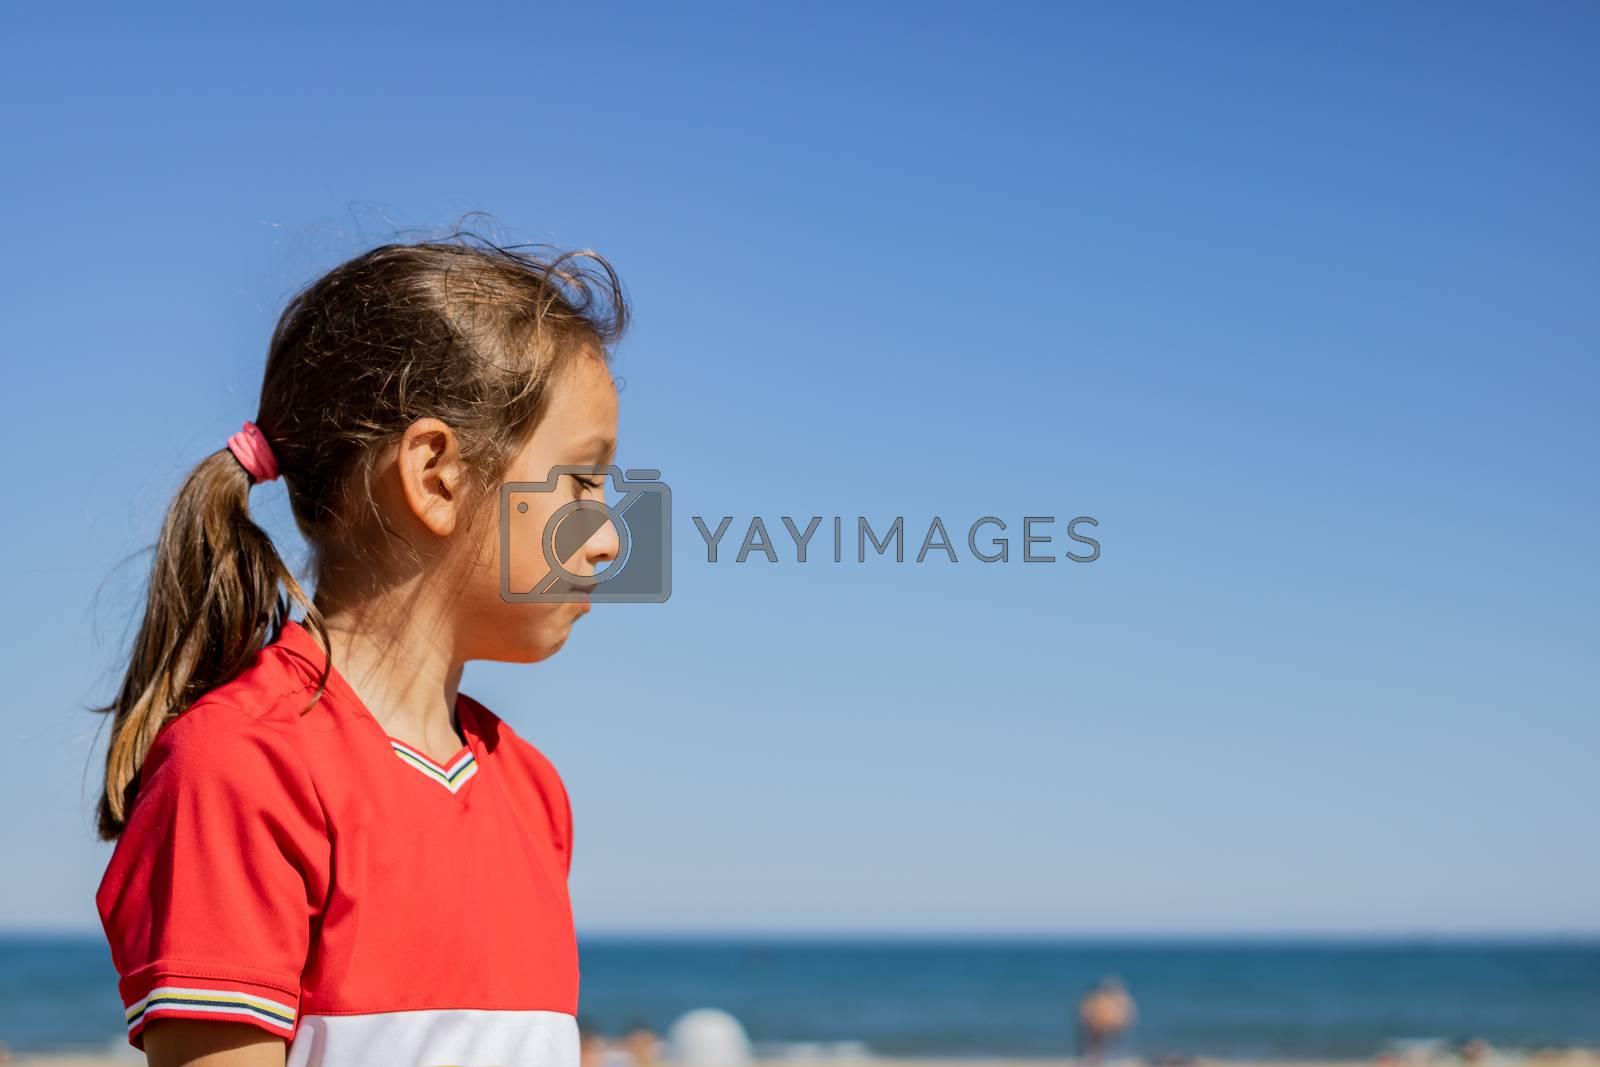 Little girl posing on the beach by Barriolo82